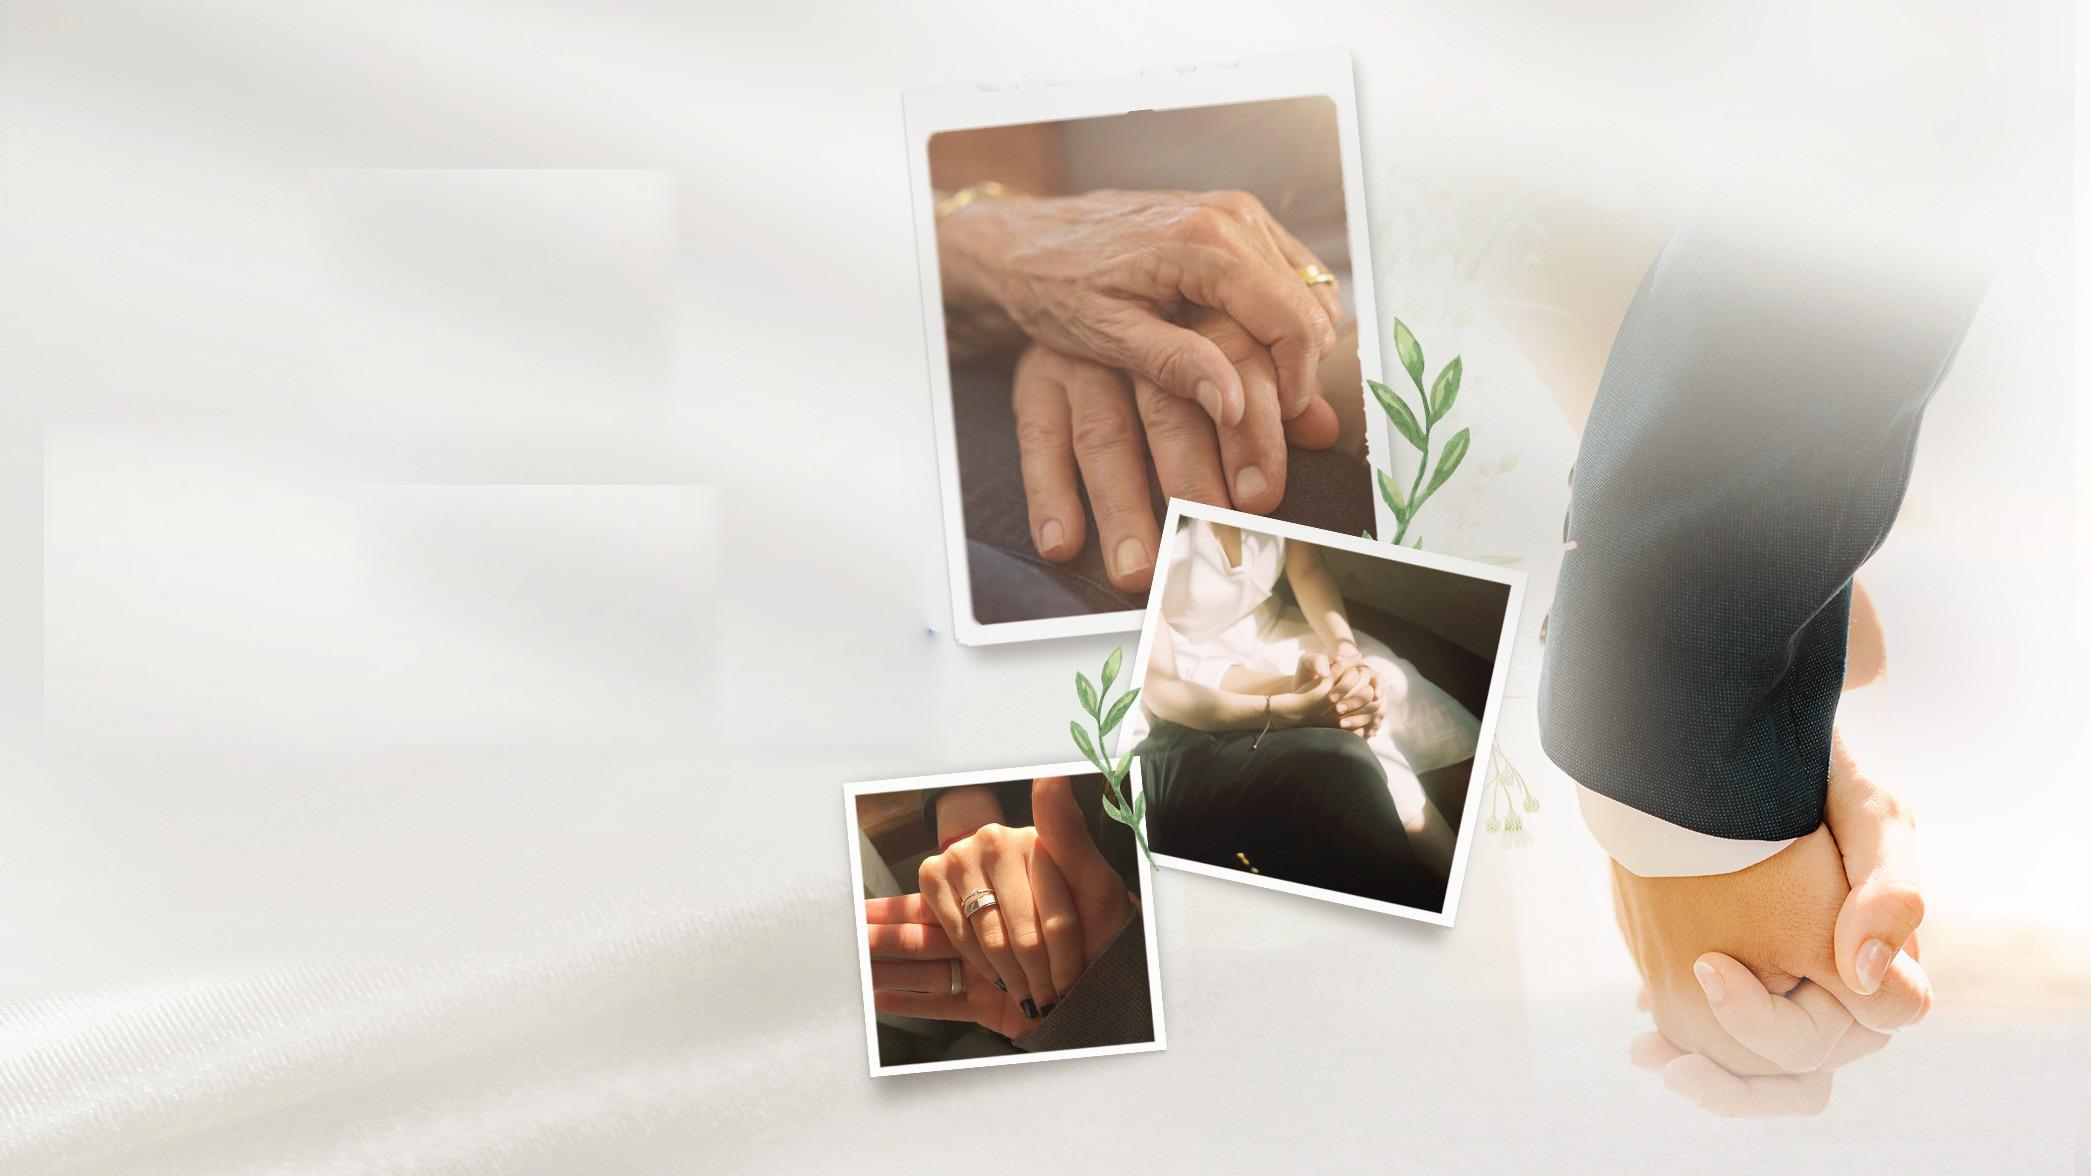 MV 'Ta vẫn nắm tay nhau'